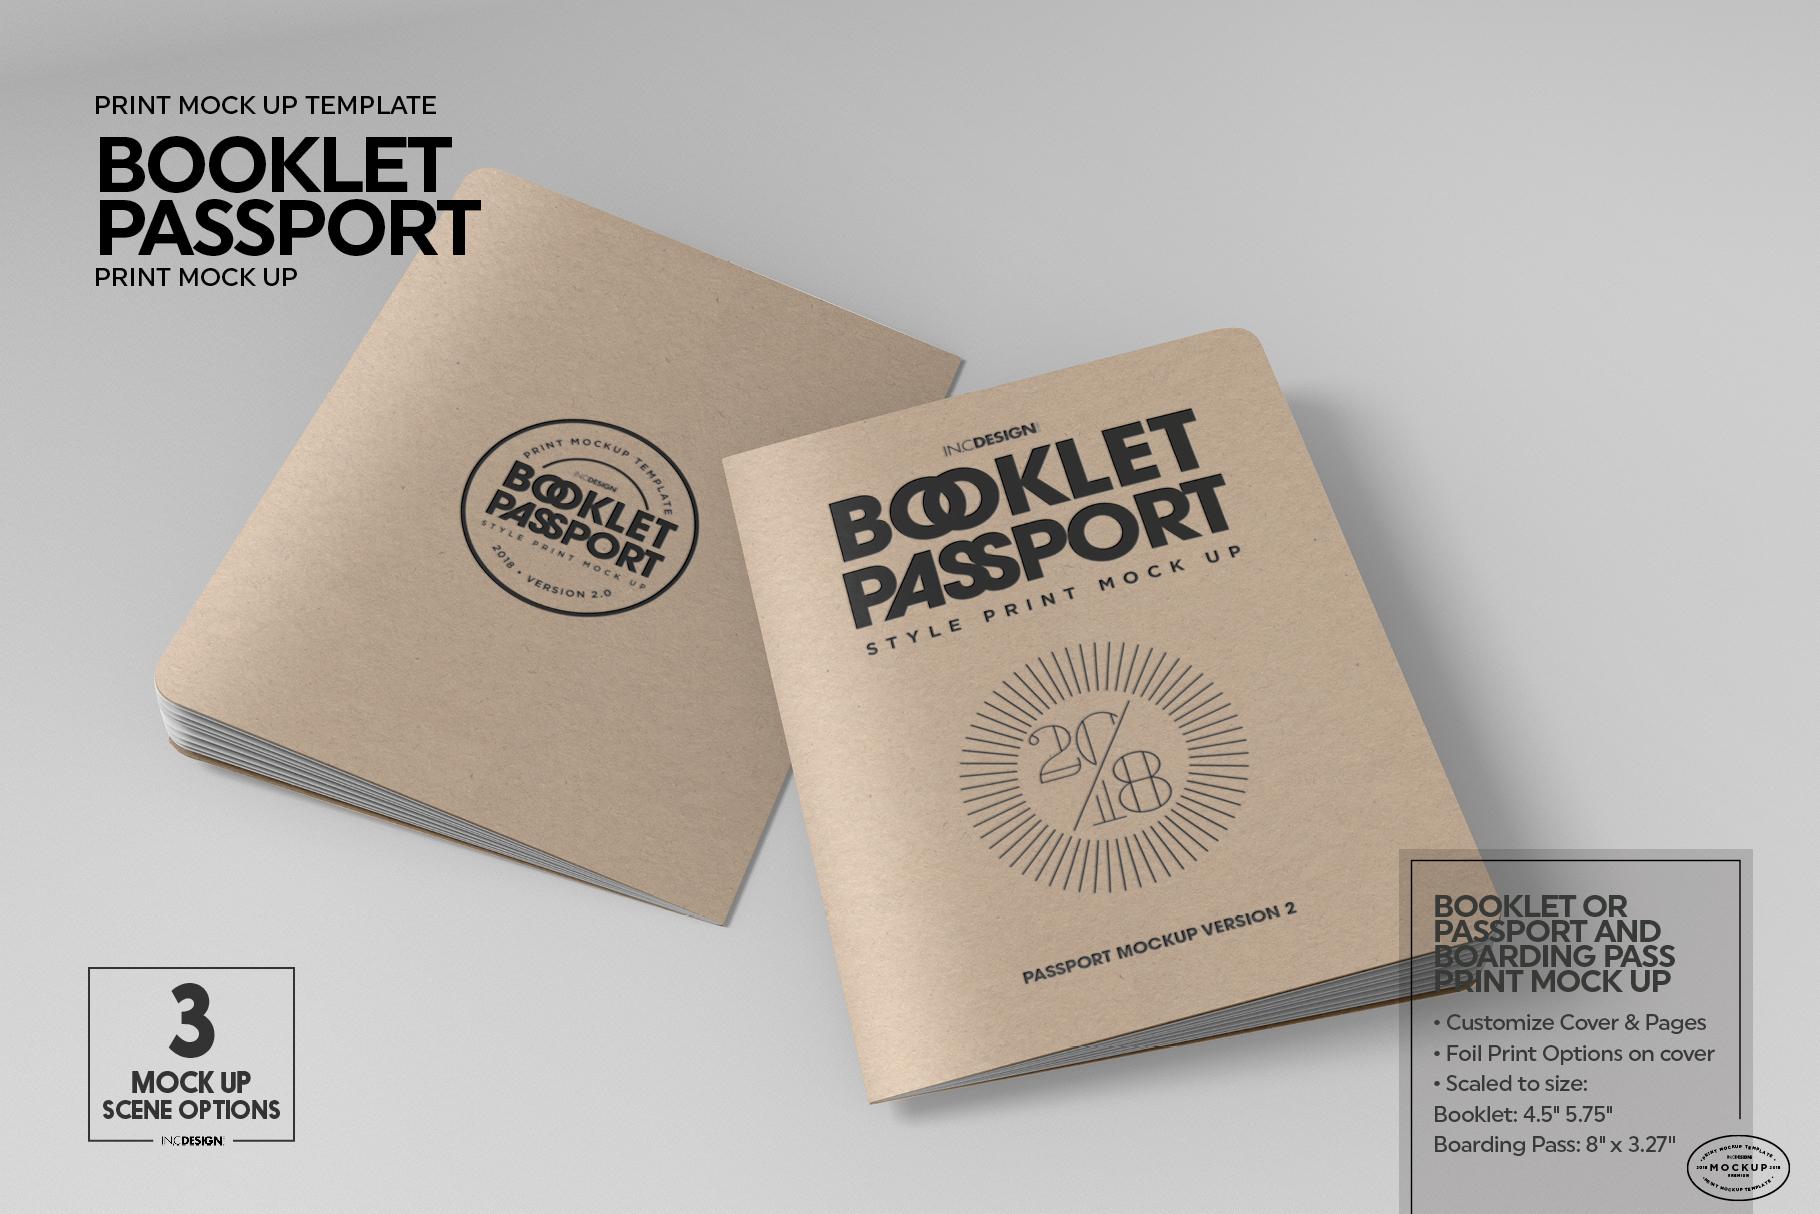 Booklet Passport Print MockUp example image 3